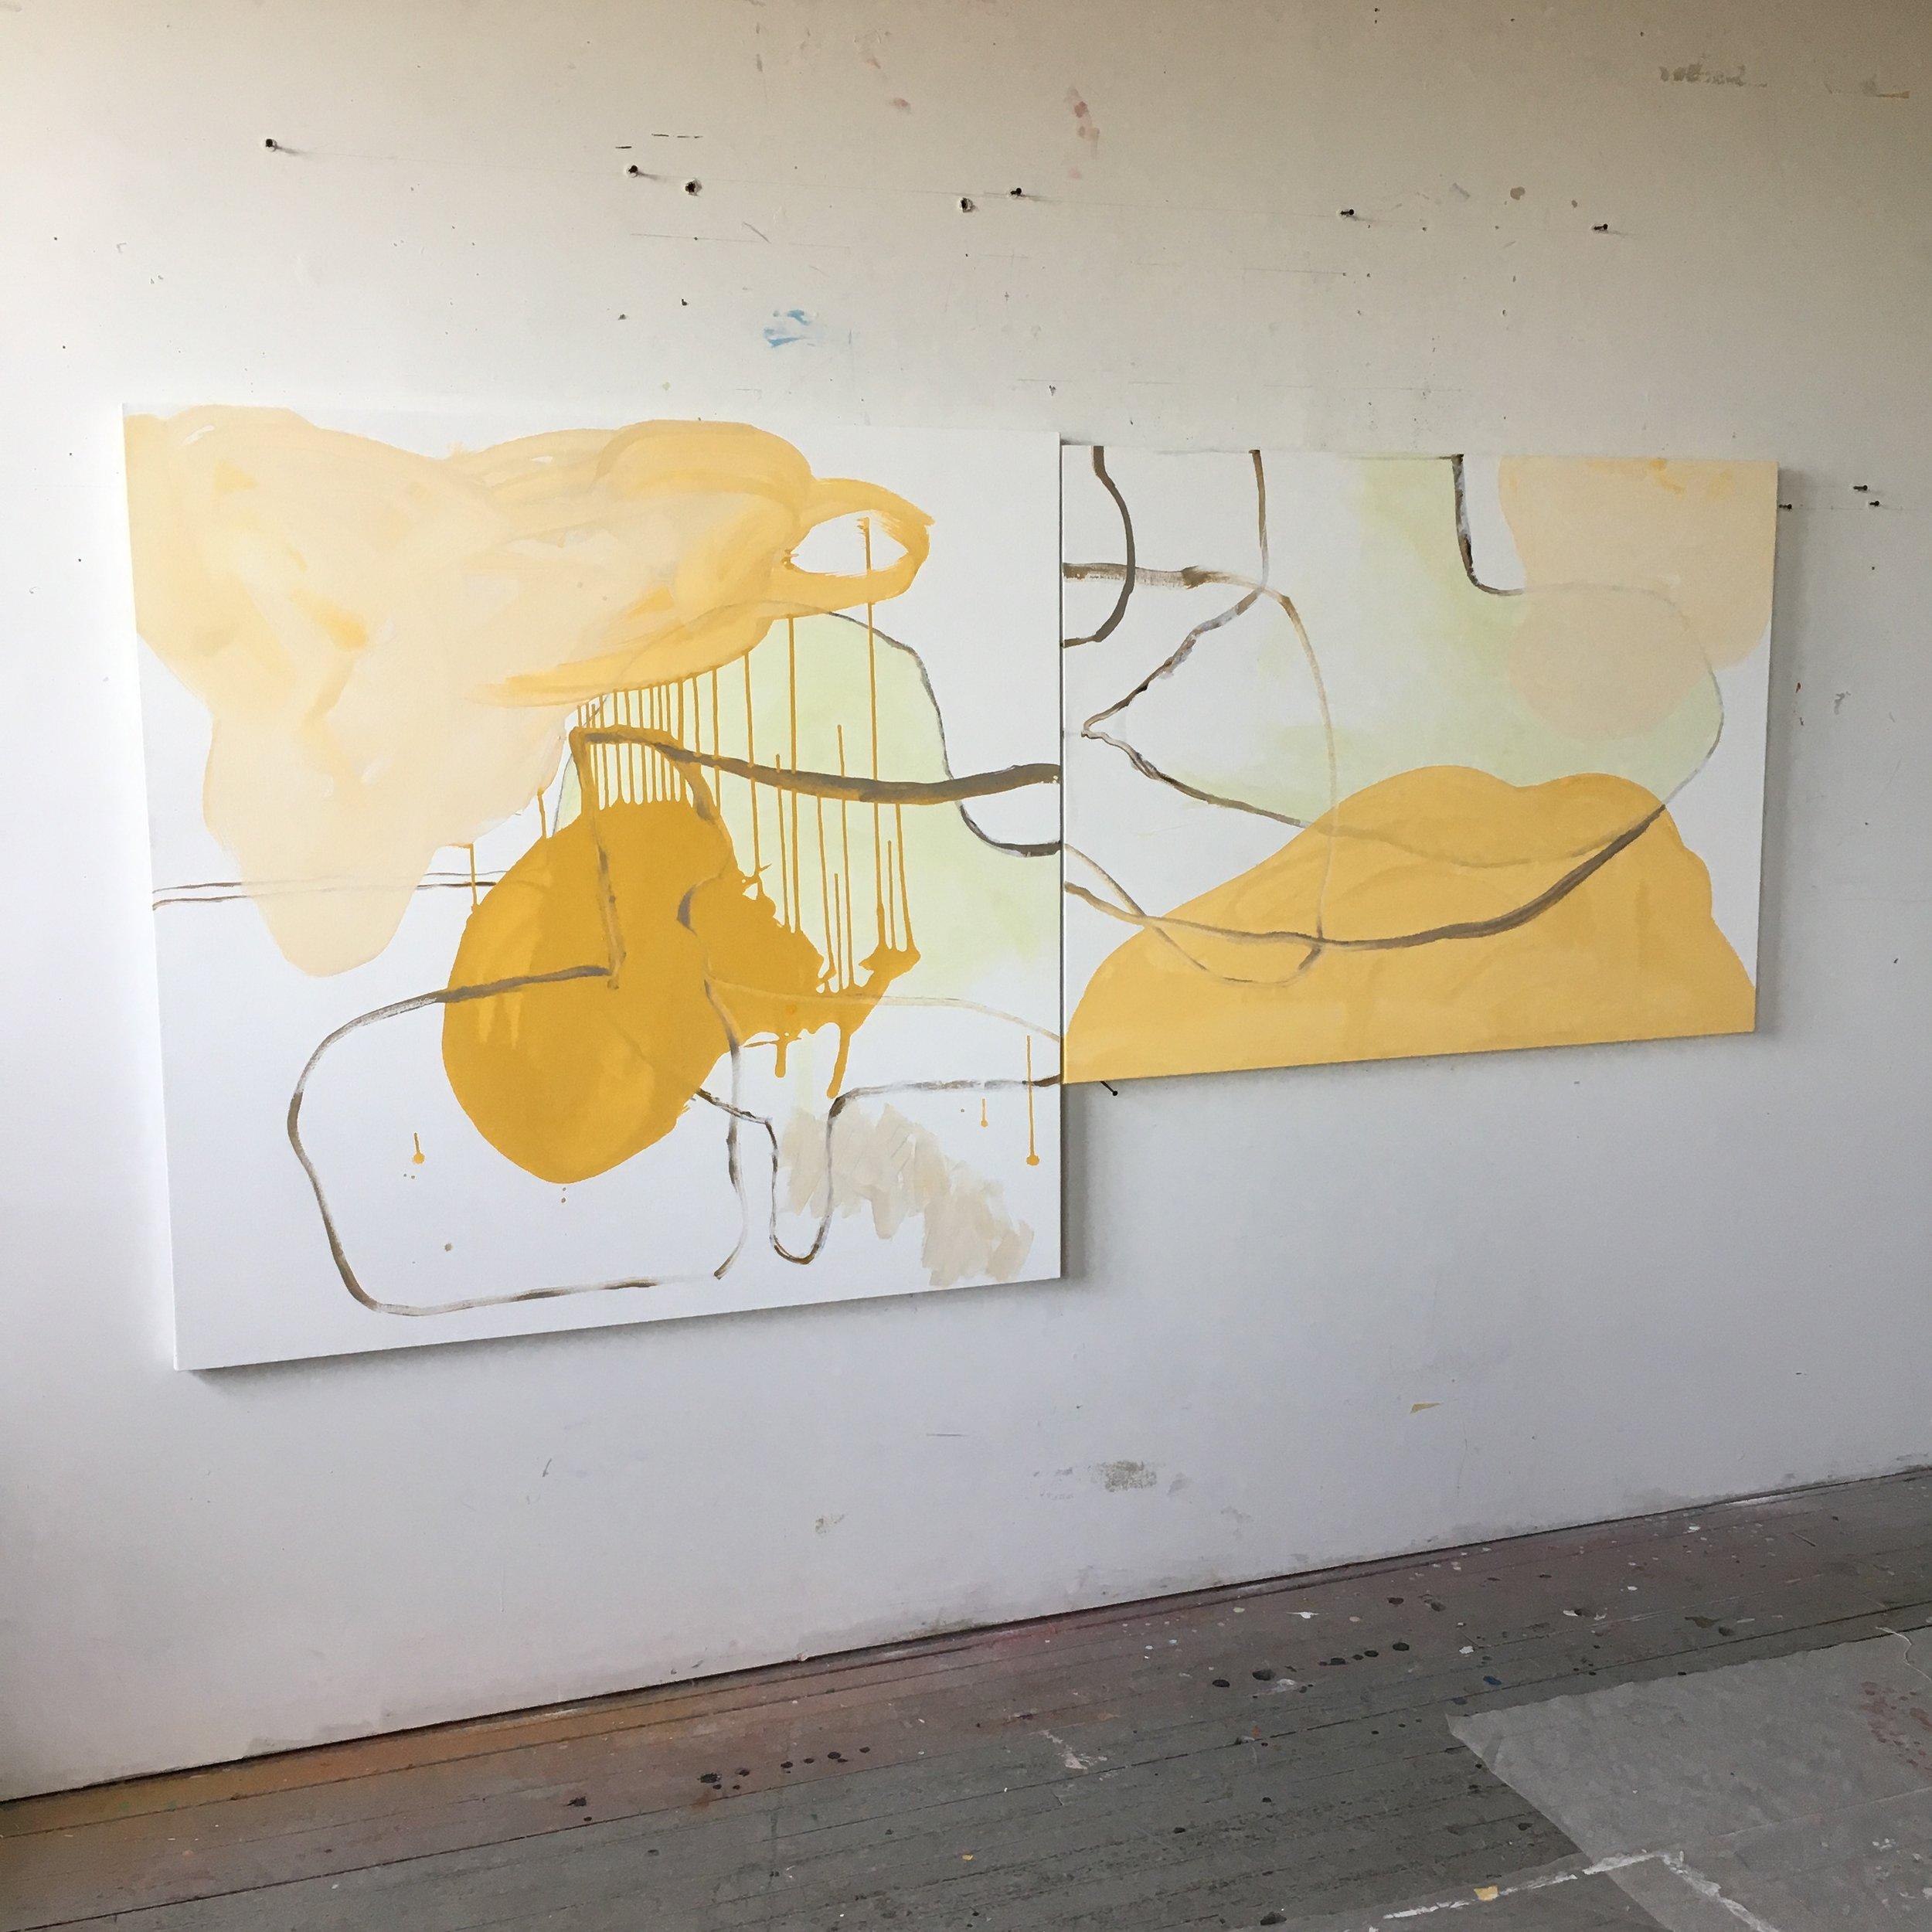 "Untitled, 2017, acrylic on canvas, 96"" x 48"" x 1.5"""